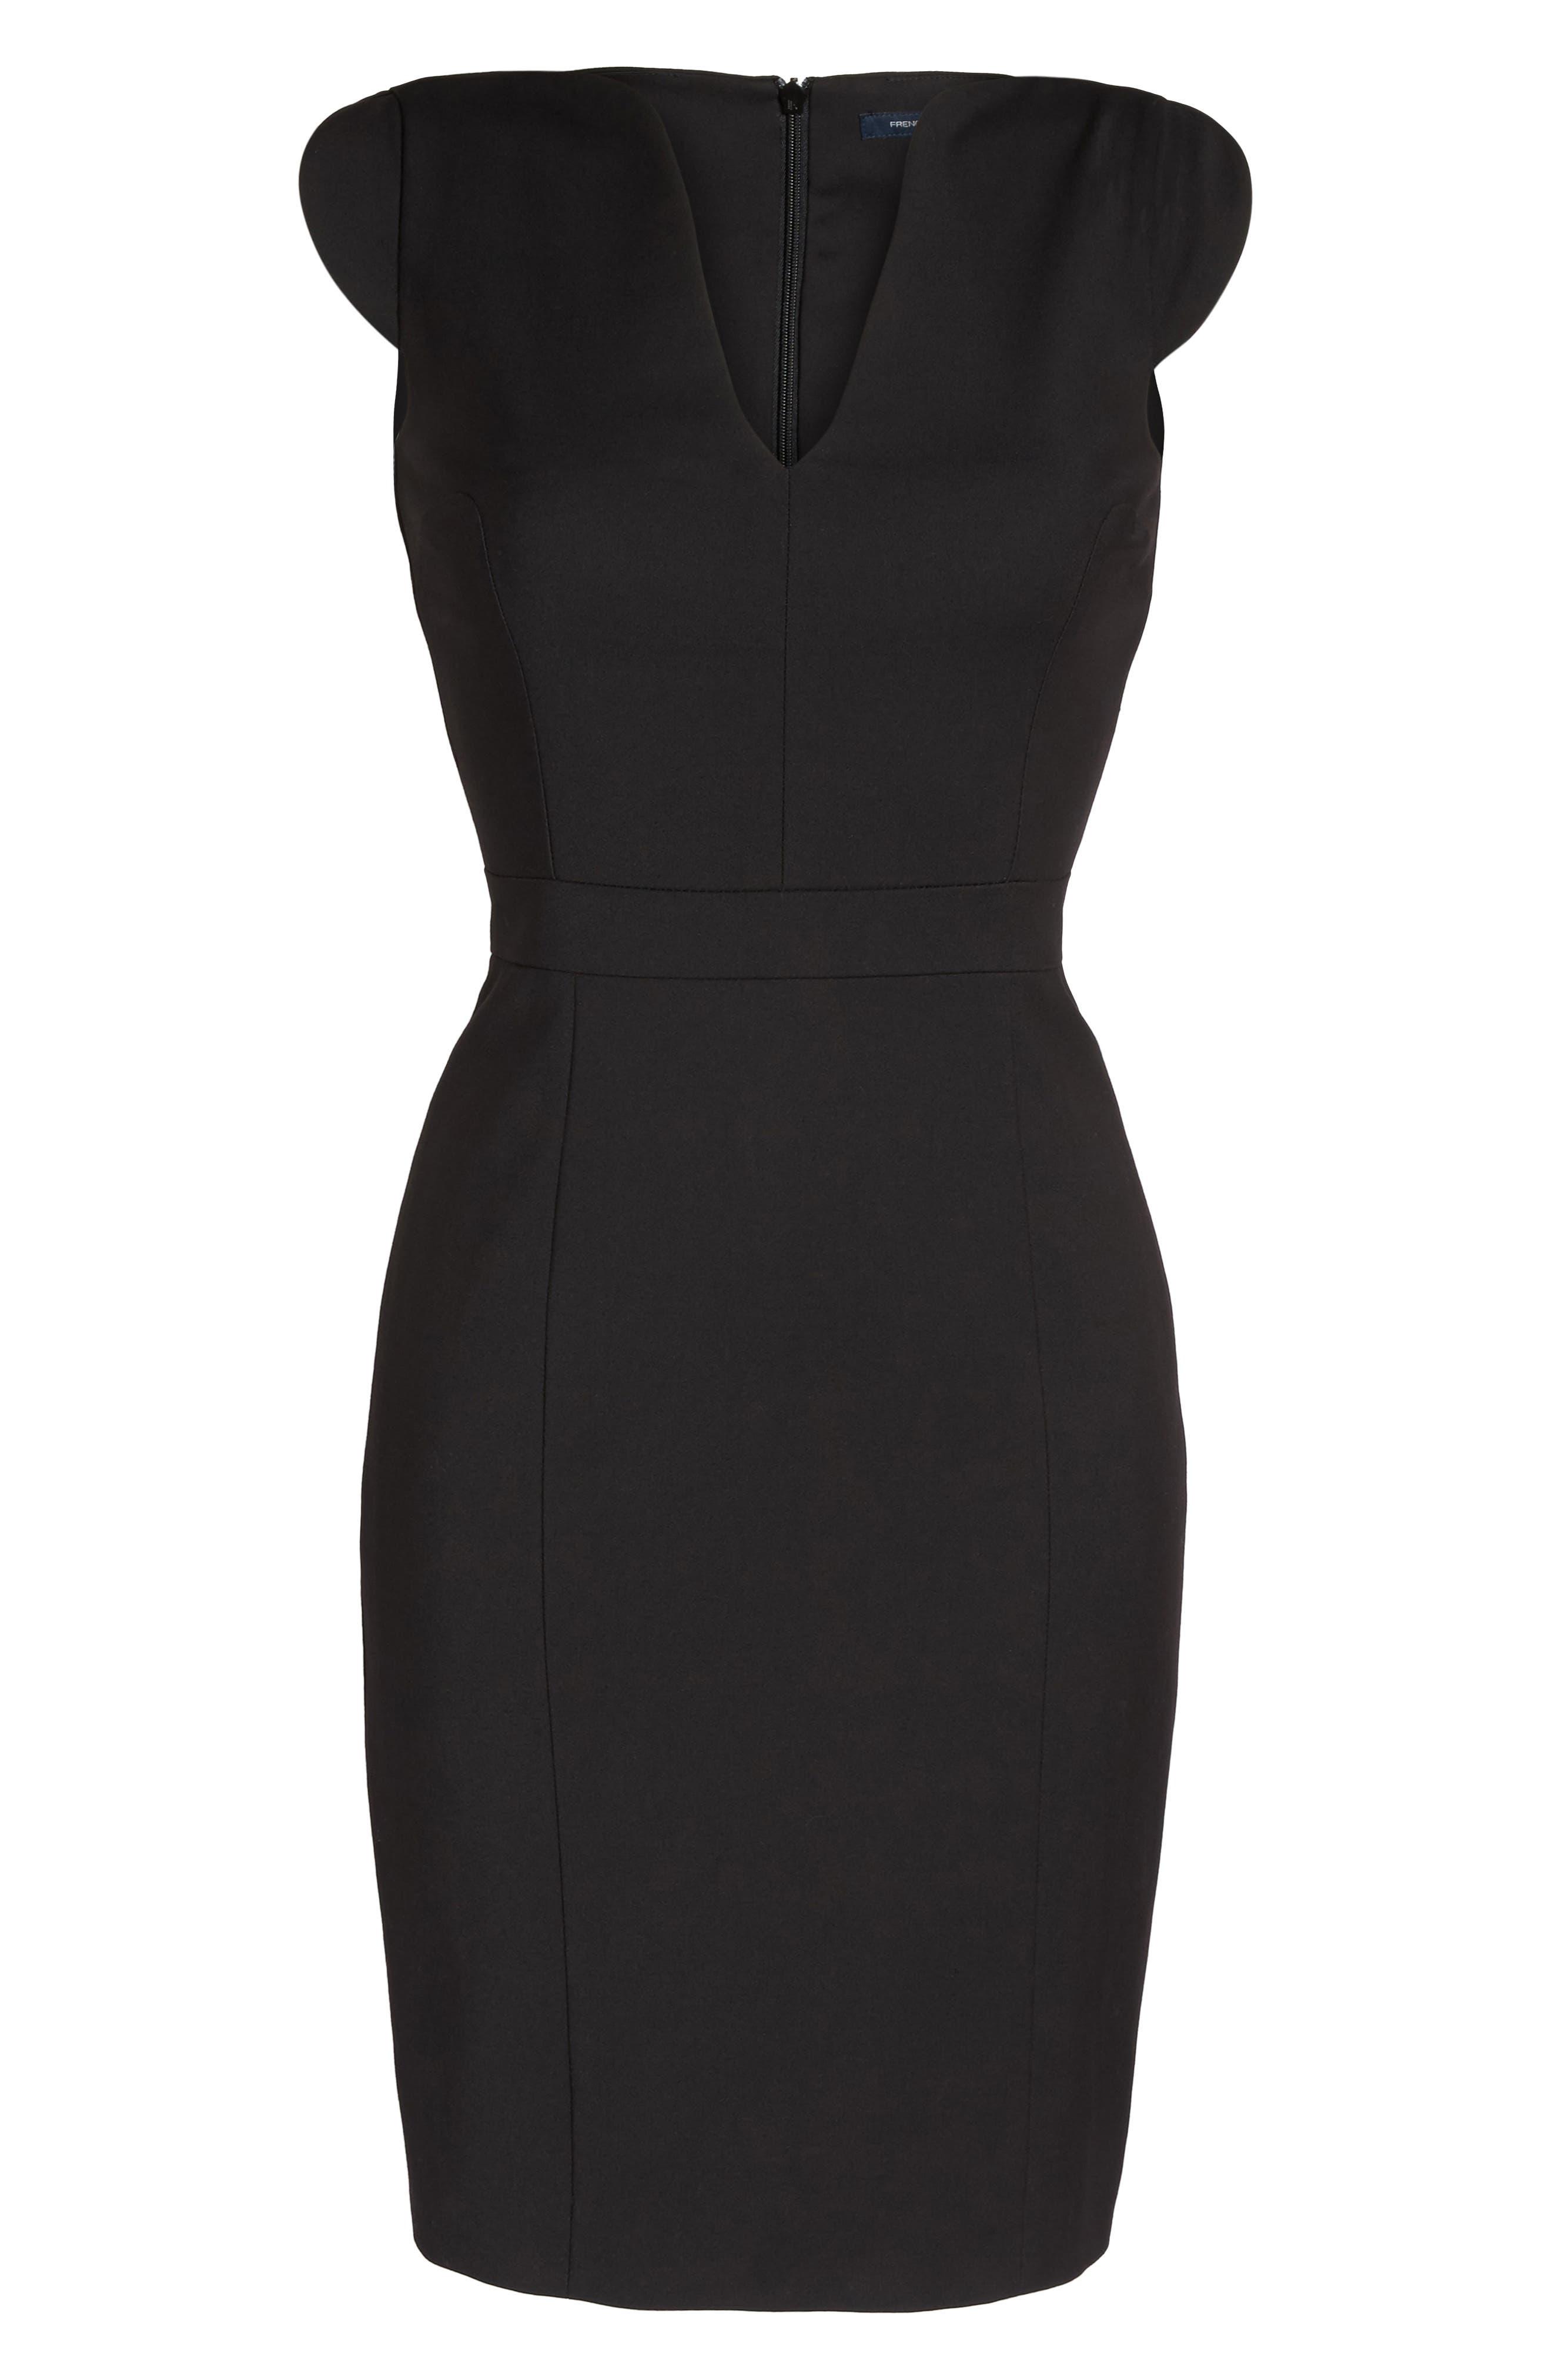 'Lolo' Stretch Sheath Dress,                             Alternate thumbnail 8, color,                             BLACK